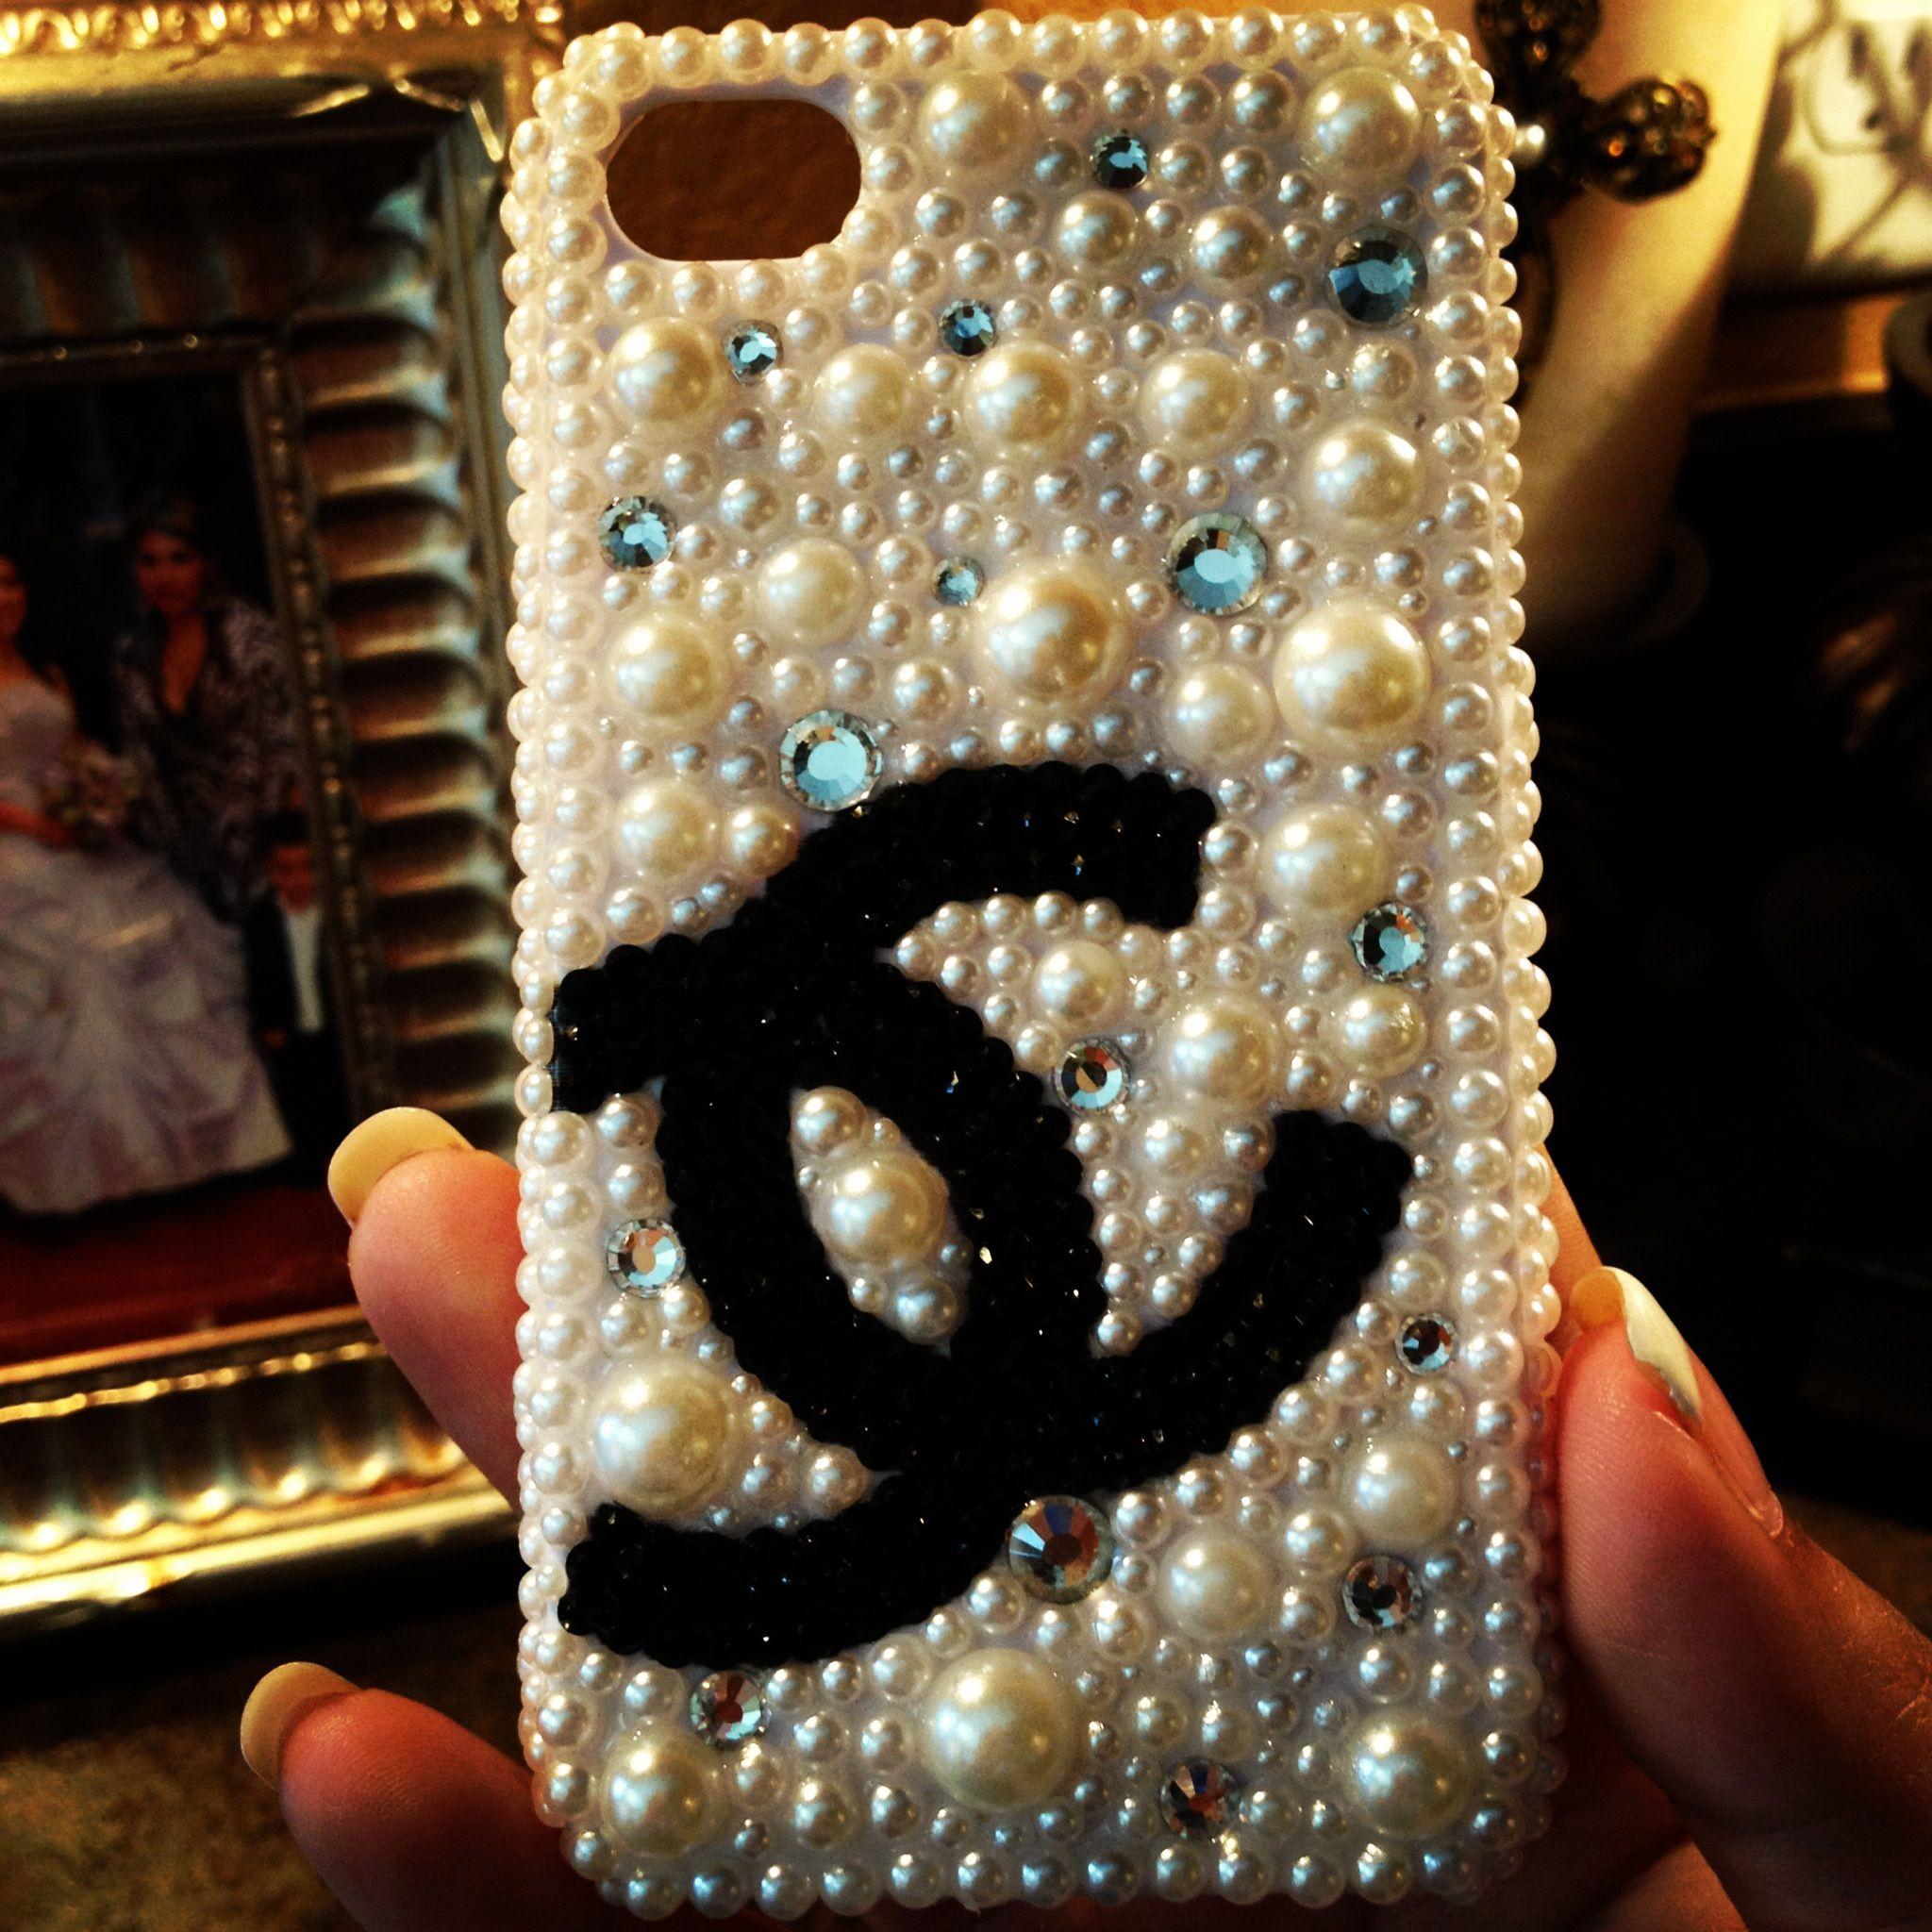 Finally got my chanel iPhone case. yay! love it